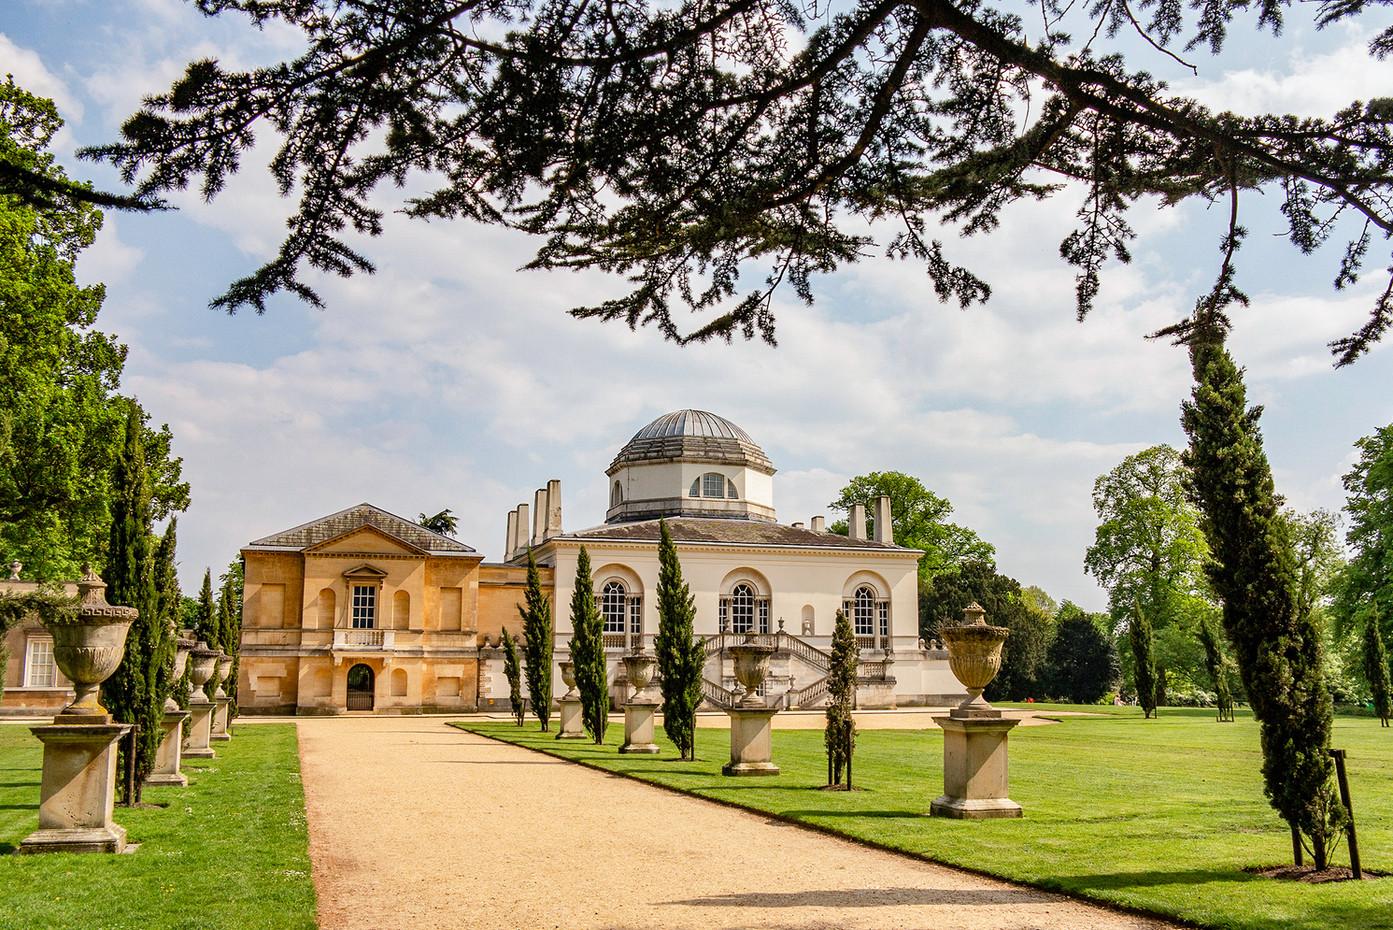 Chiswick House & Gardens in London, UK